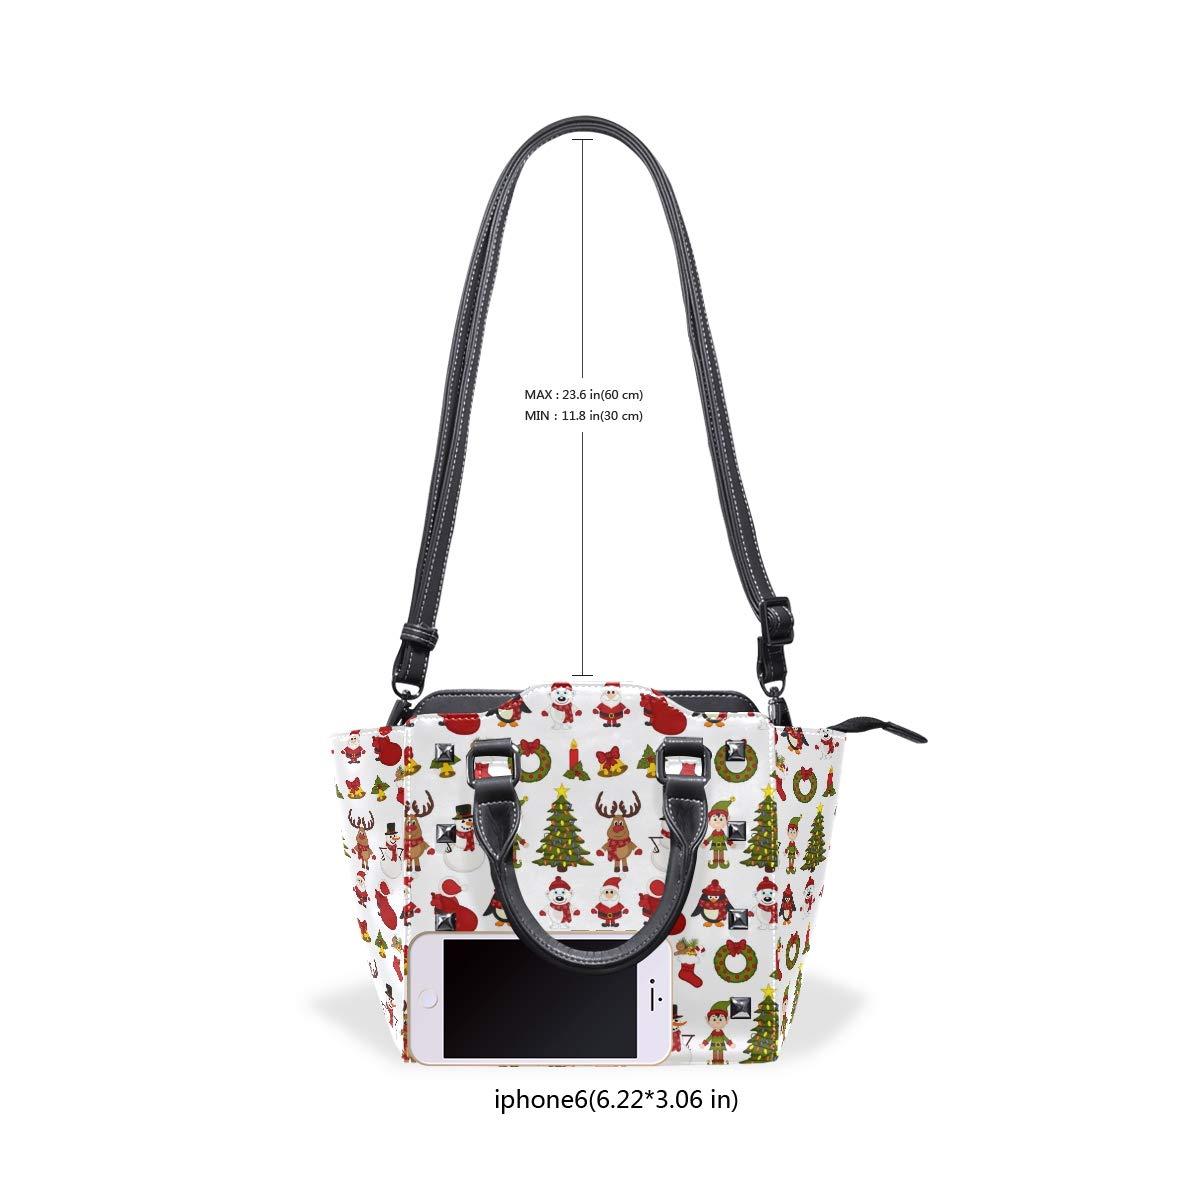 Penguin Gifts Christmas Womens fashion Handbags Shoulder Bags Handle Satchel